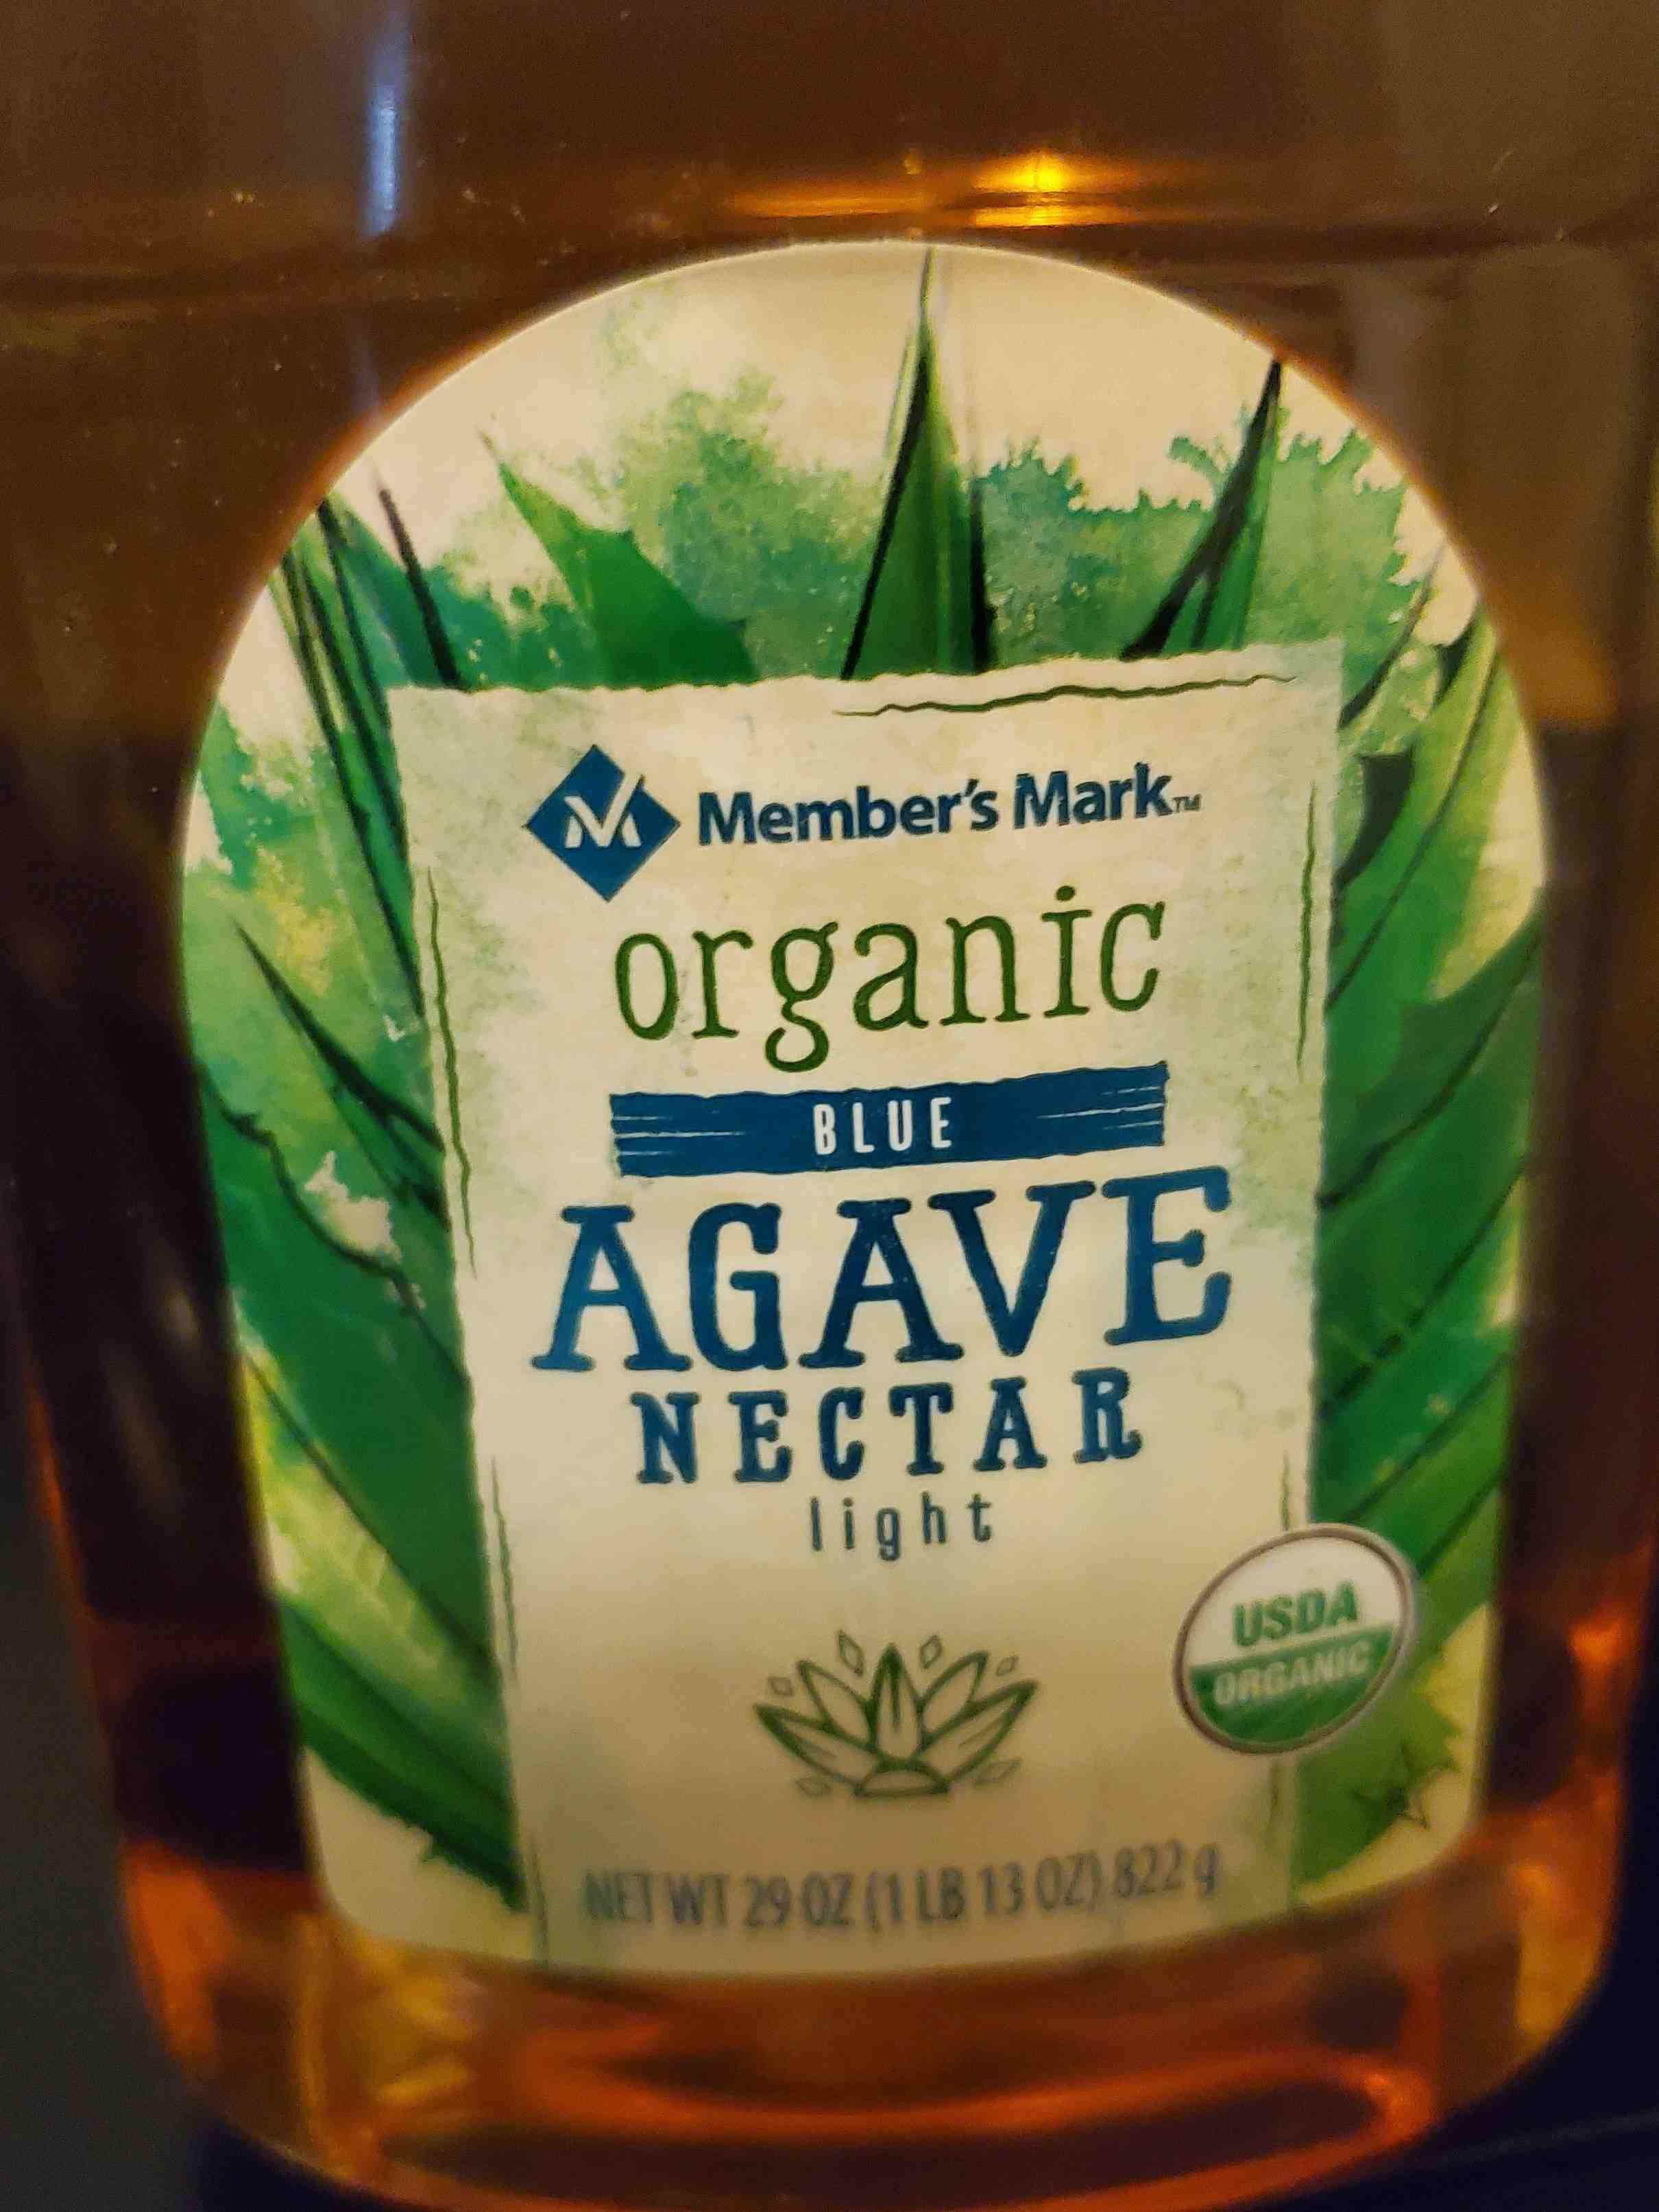 agave nectar - Product